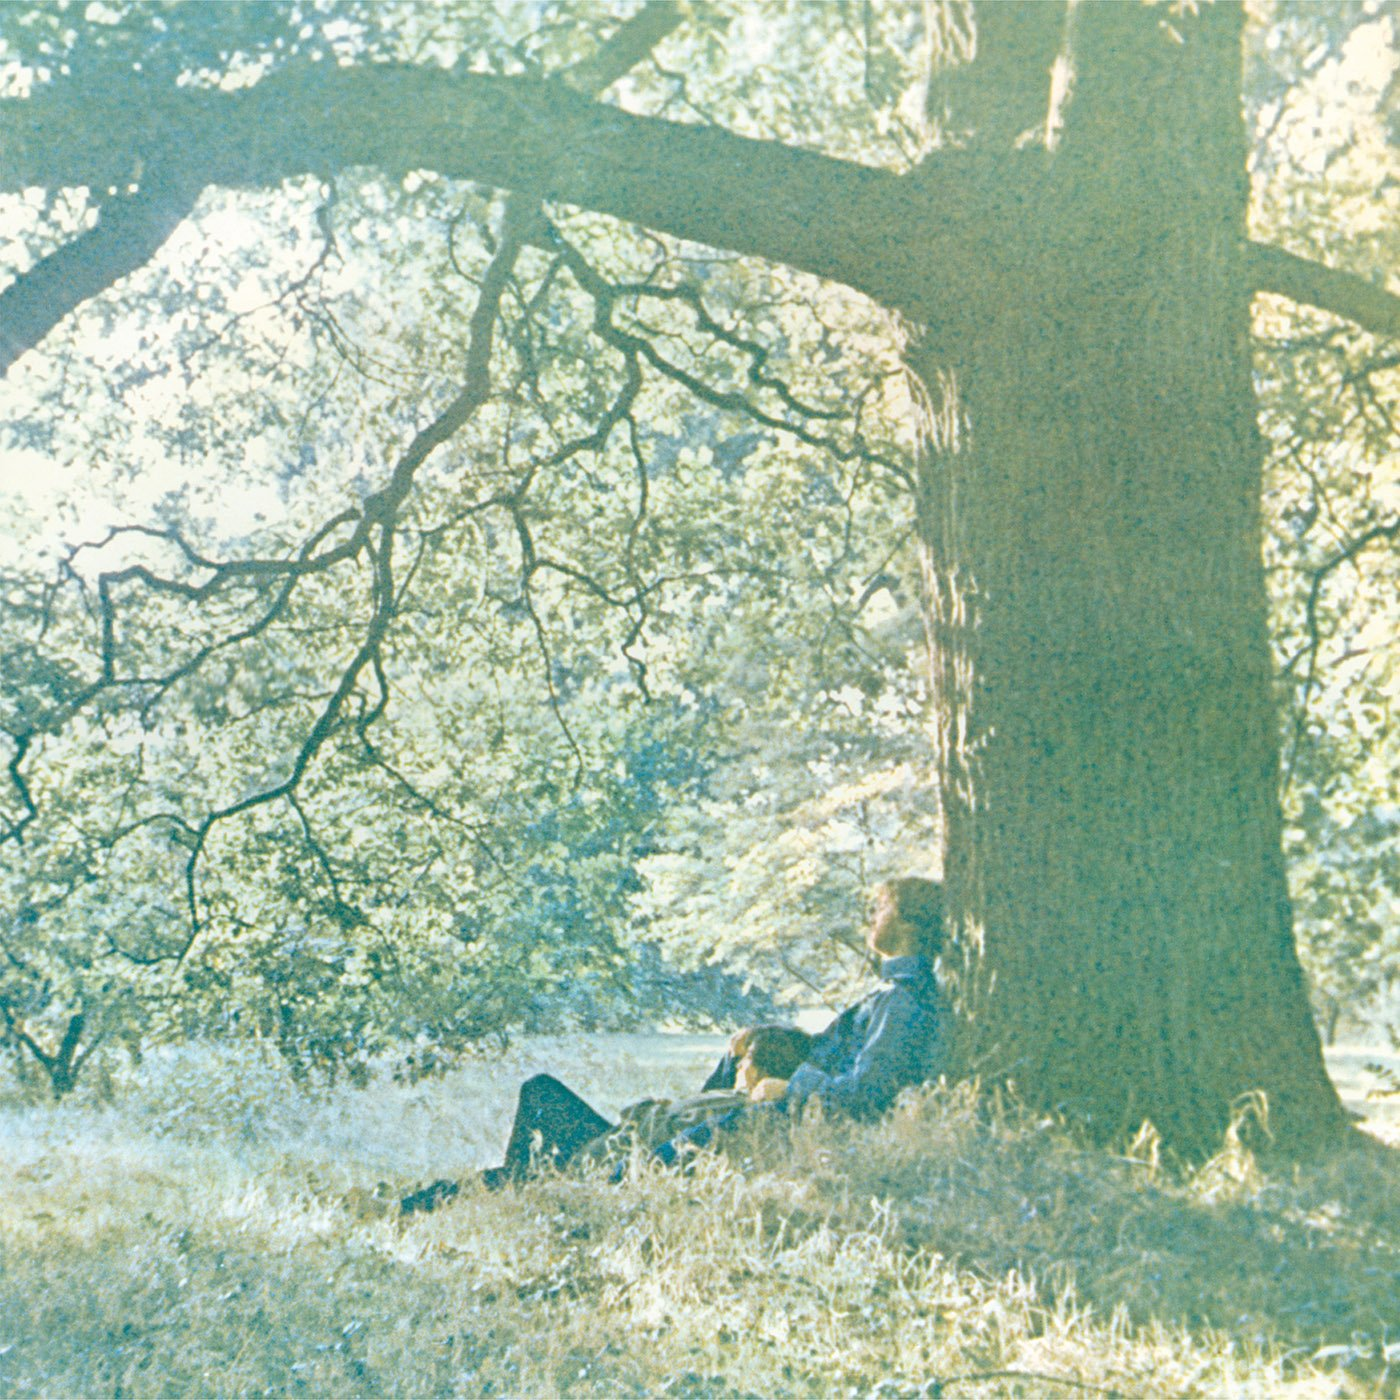 Yoko Ono - Plastic Ono Band (LP Vinyl)